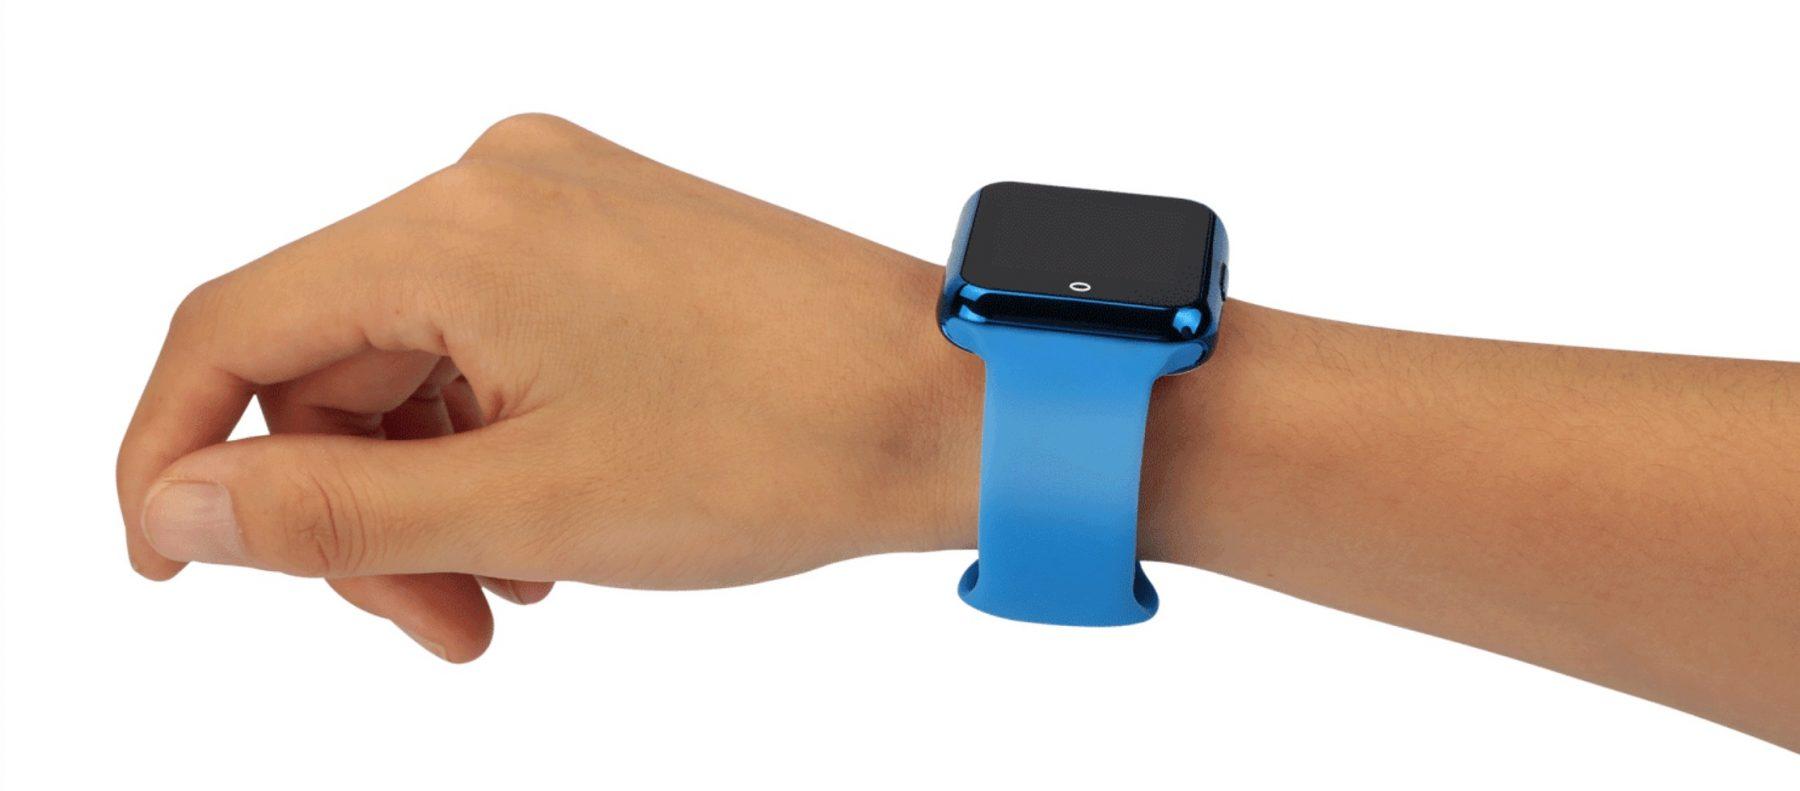 no.1 d3 smartwatch image